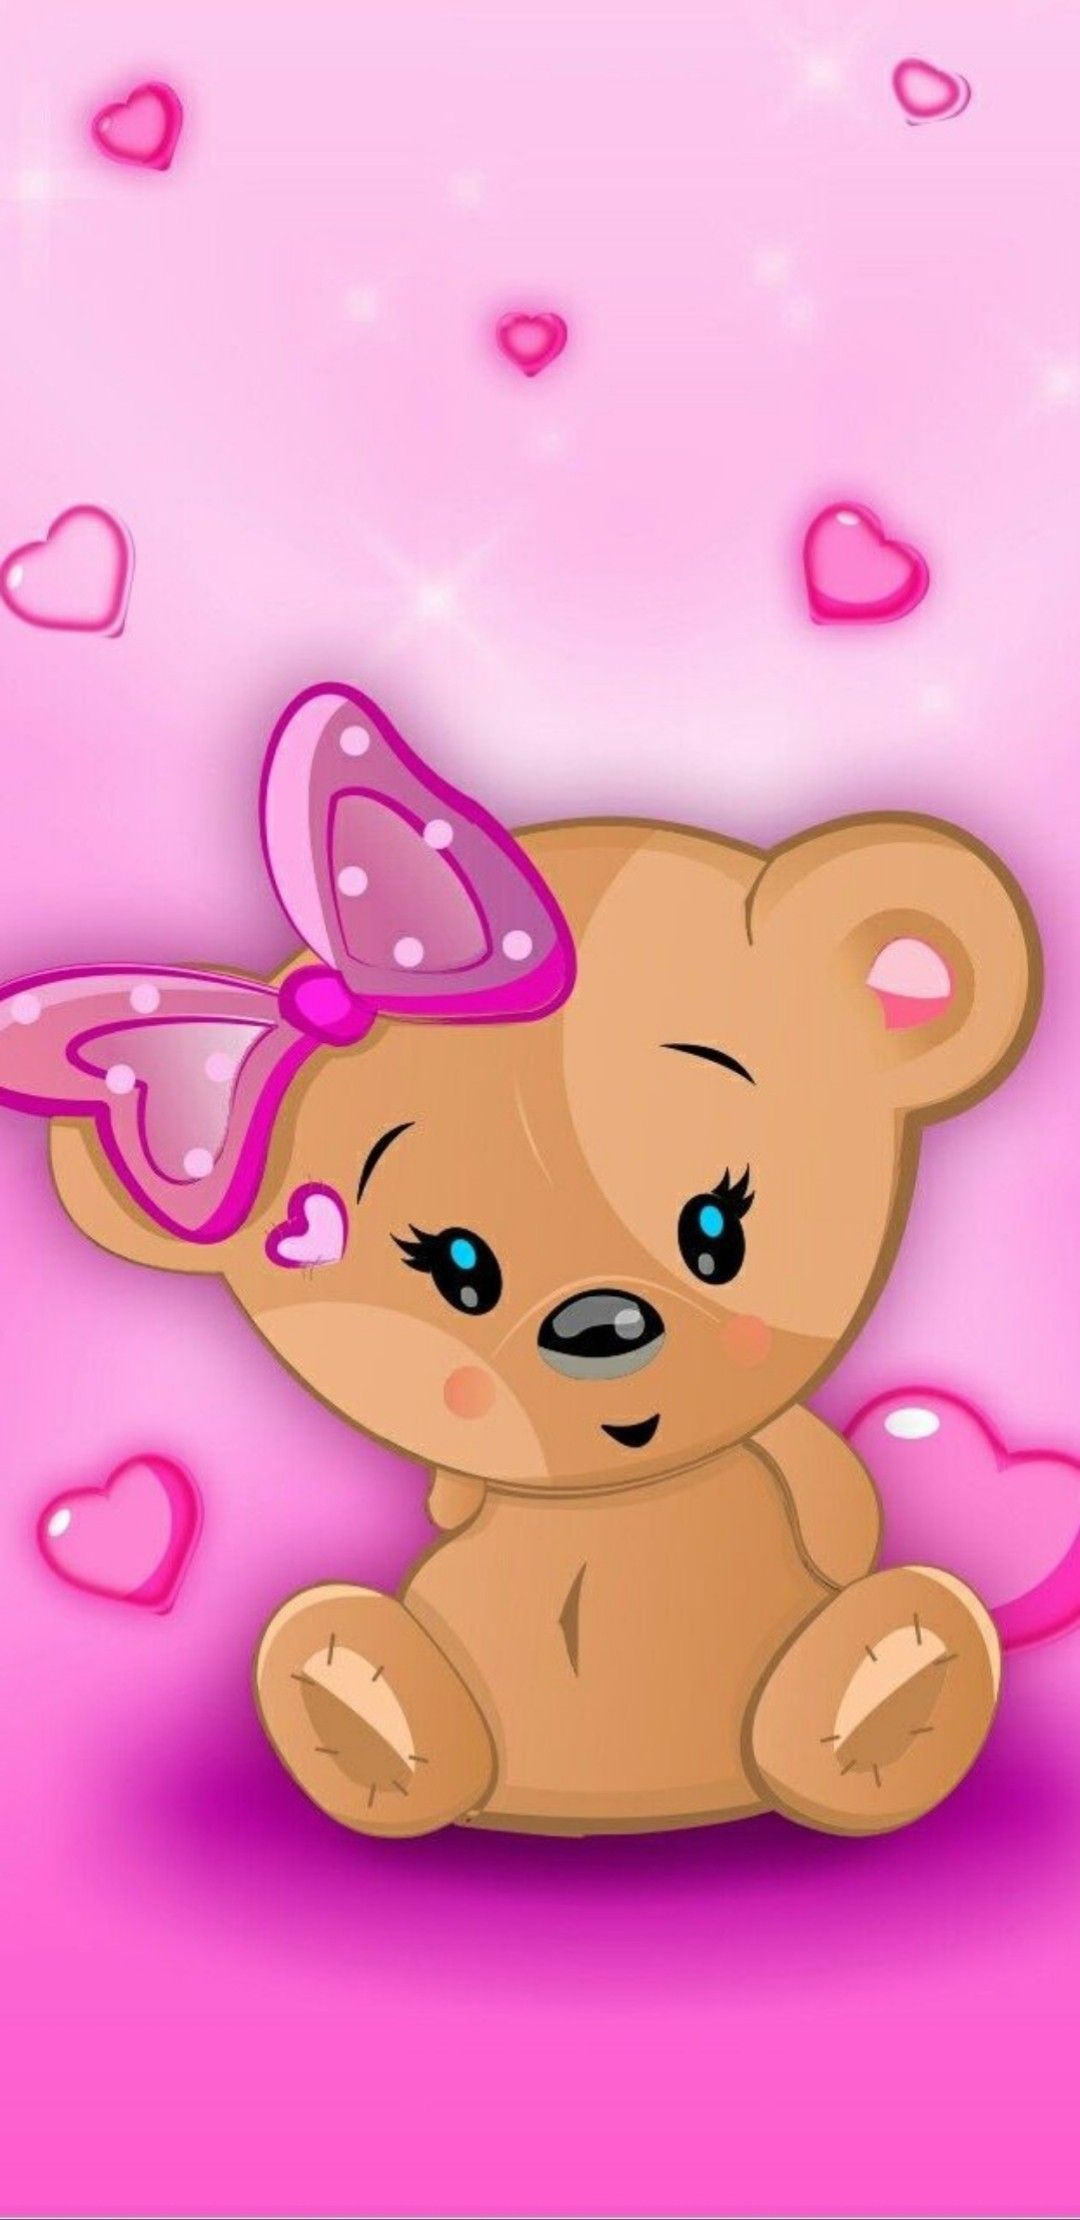 Pin By Lydia Cordero On Cute Wallpaper 1 Teddy Bear Wallpaper Bear Wallpaper Wallpaper Iphone Cute